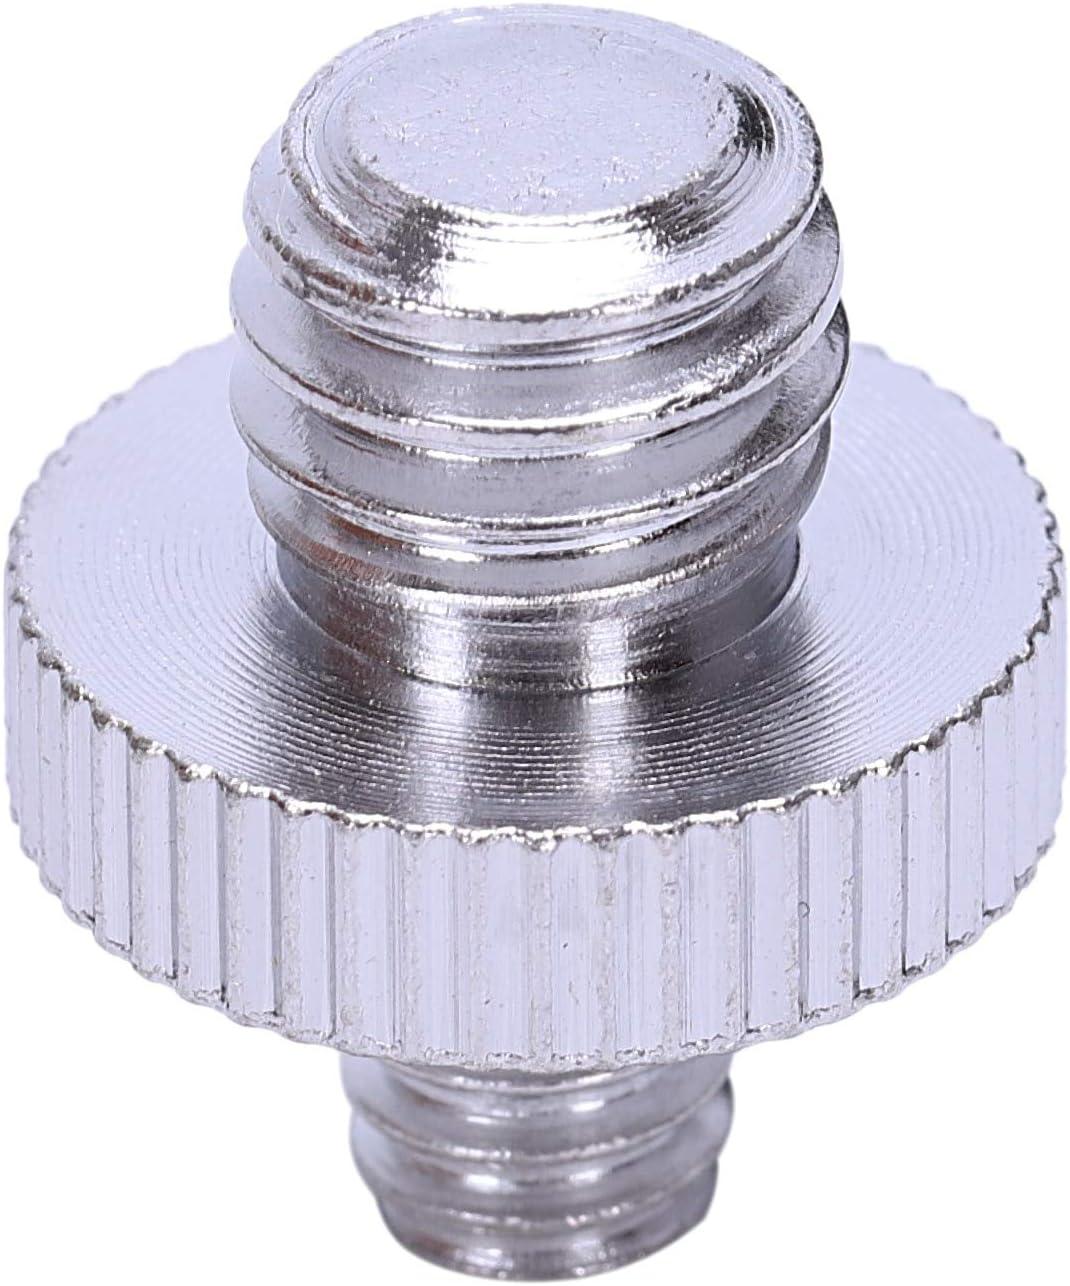 Screw FDDT Camera Screw Adapter 1//4 inch Male to 1//4 inch Male Screw 1//4 Male to 3//8 Male Tripod Screw Adapter Converter Camera//Tripod